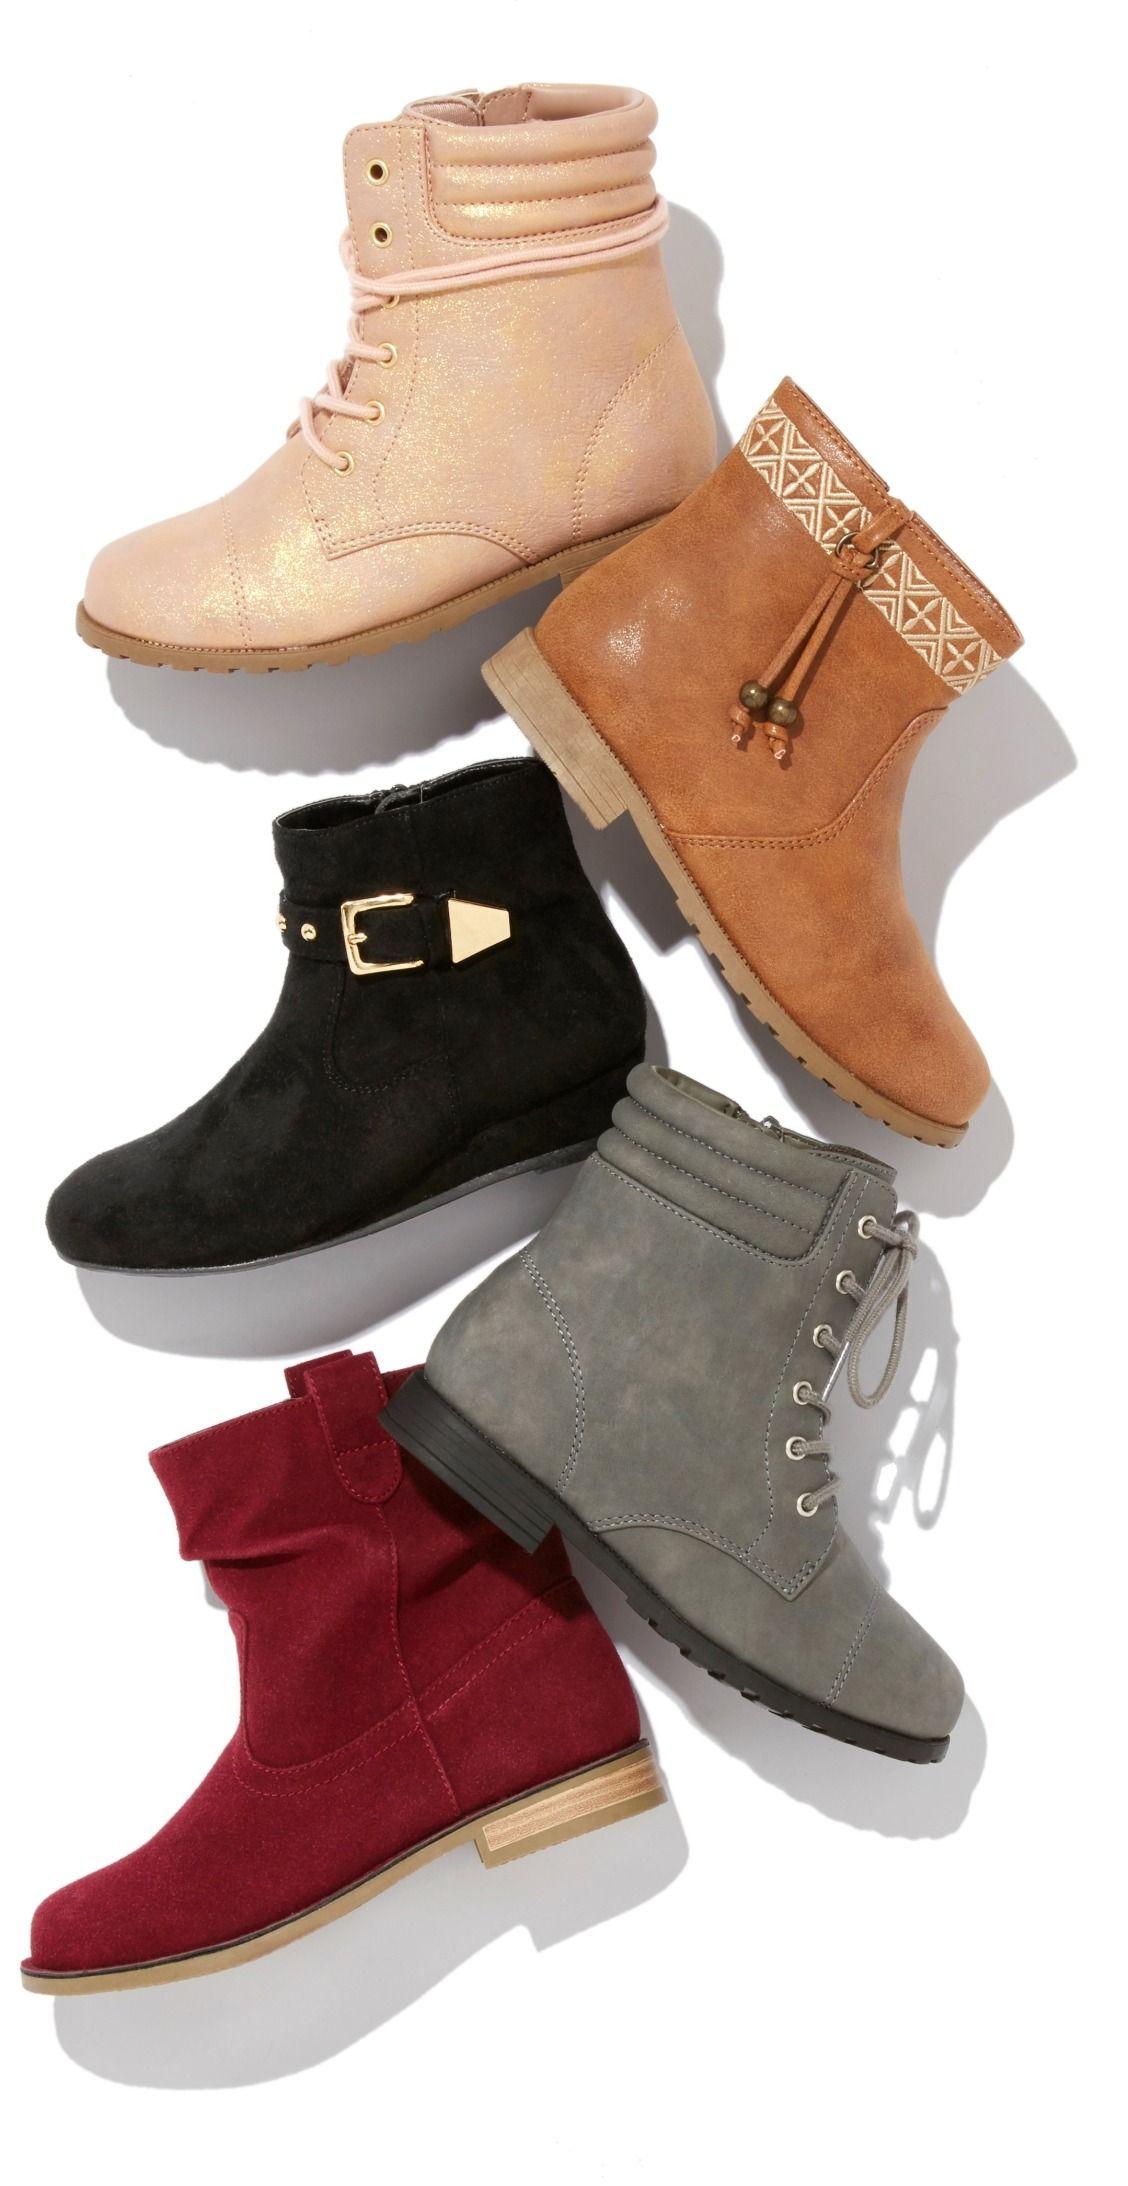 Girls fashion | Kids' shoes| Boots